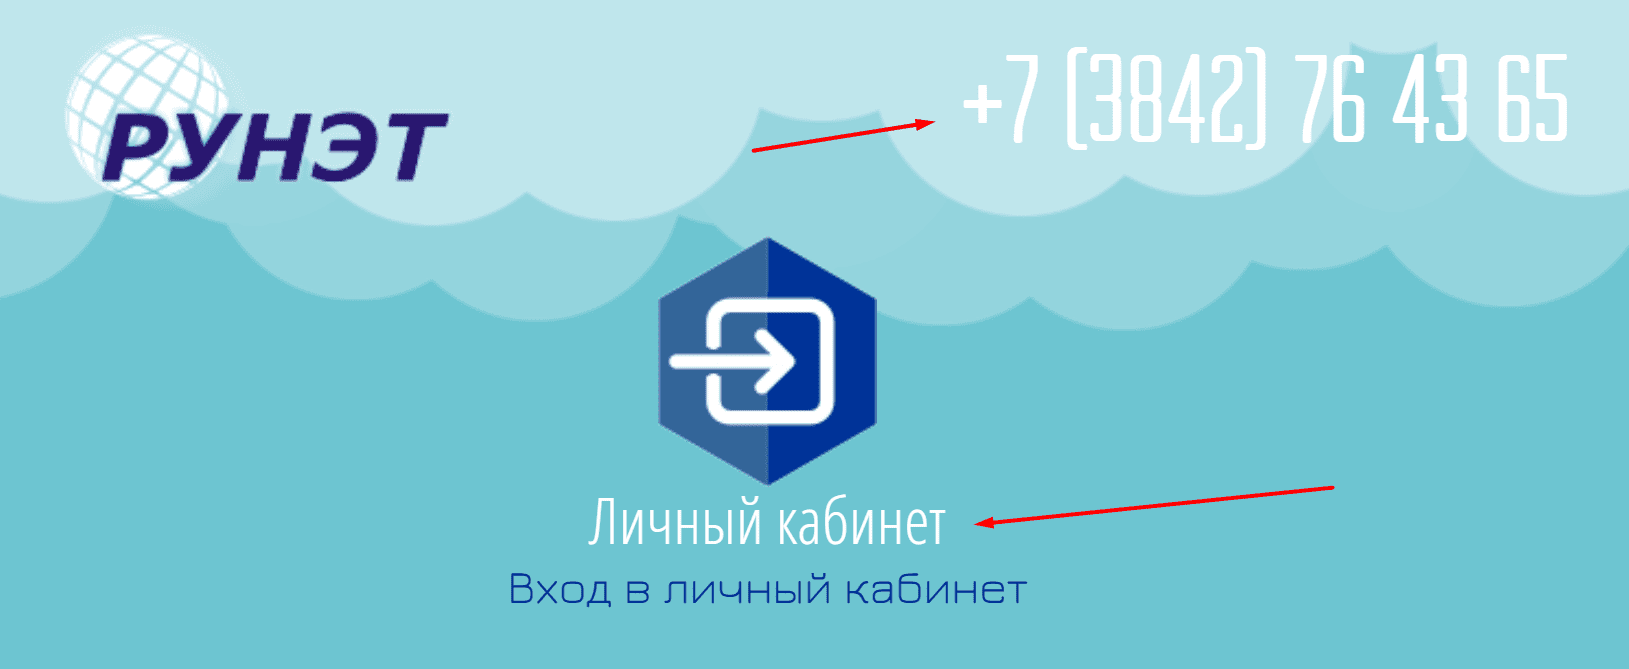 Сайт Рунет42 Ру